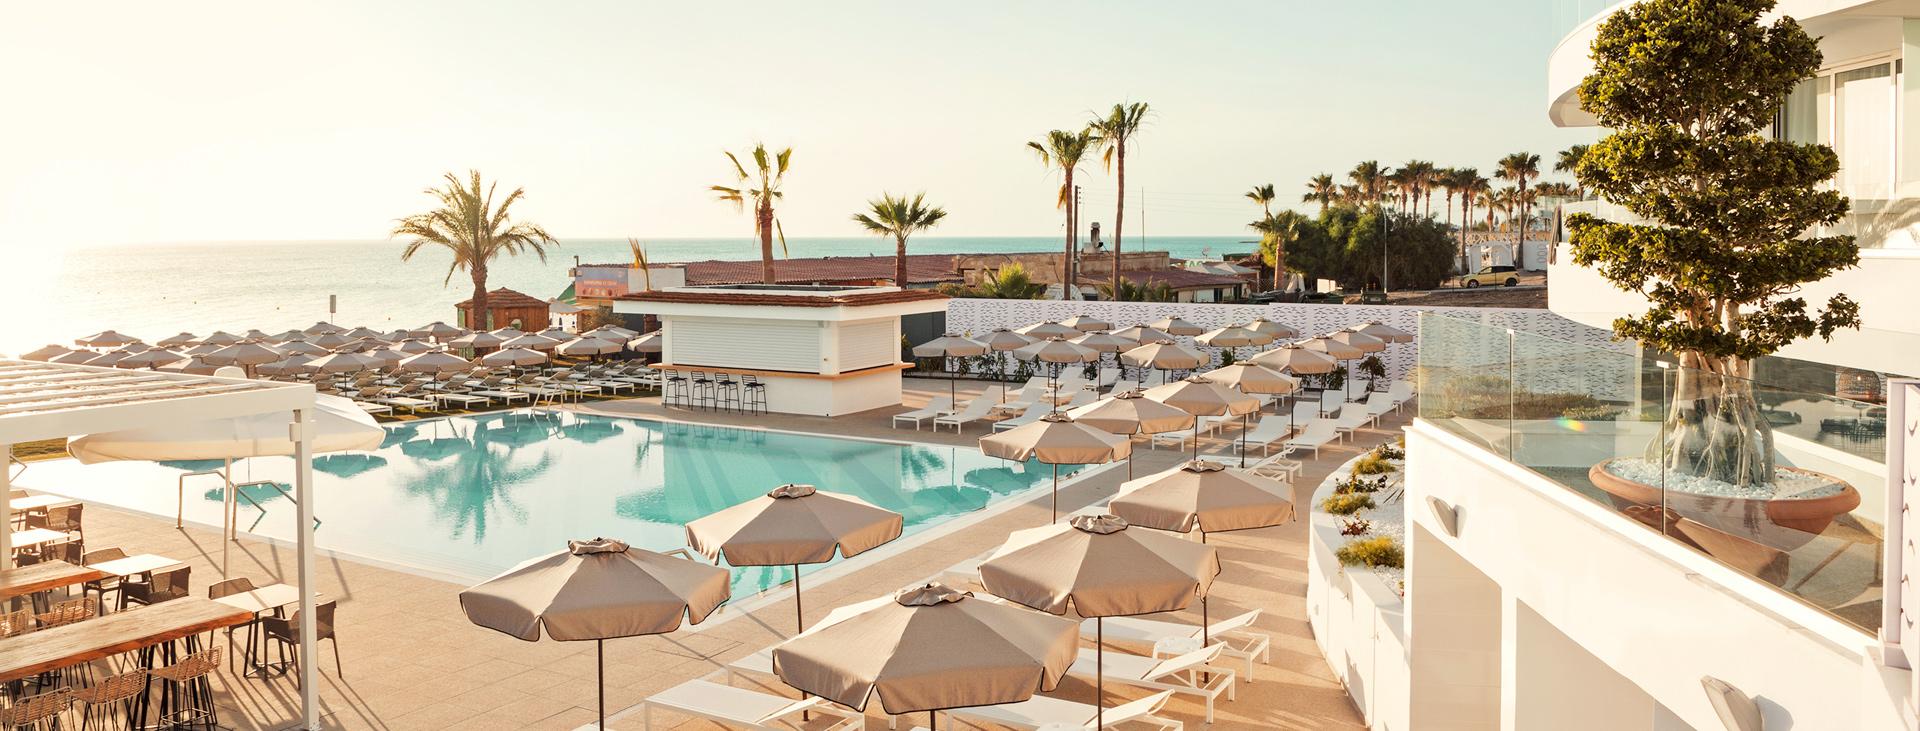 Sunprime Protaras Beach, Protaras/Fig Tree Bay, Kypros, Kypros